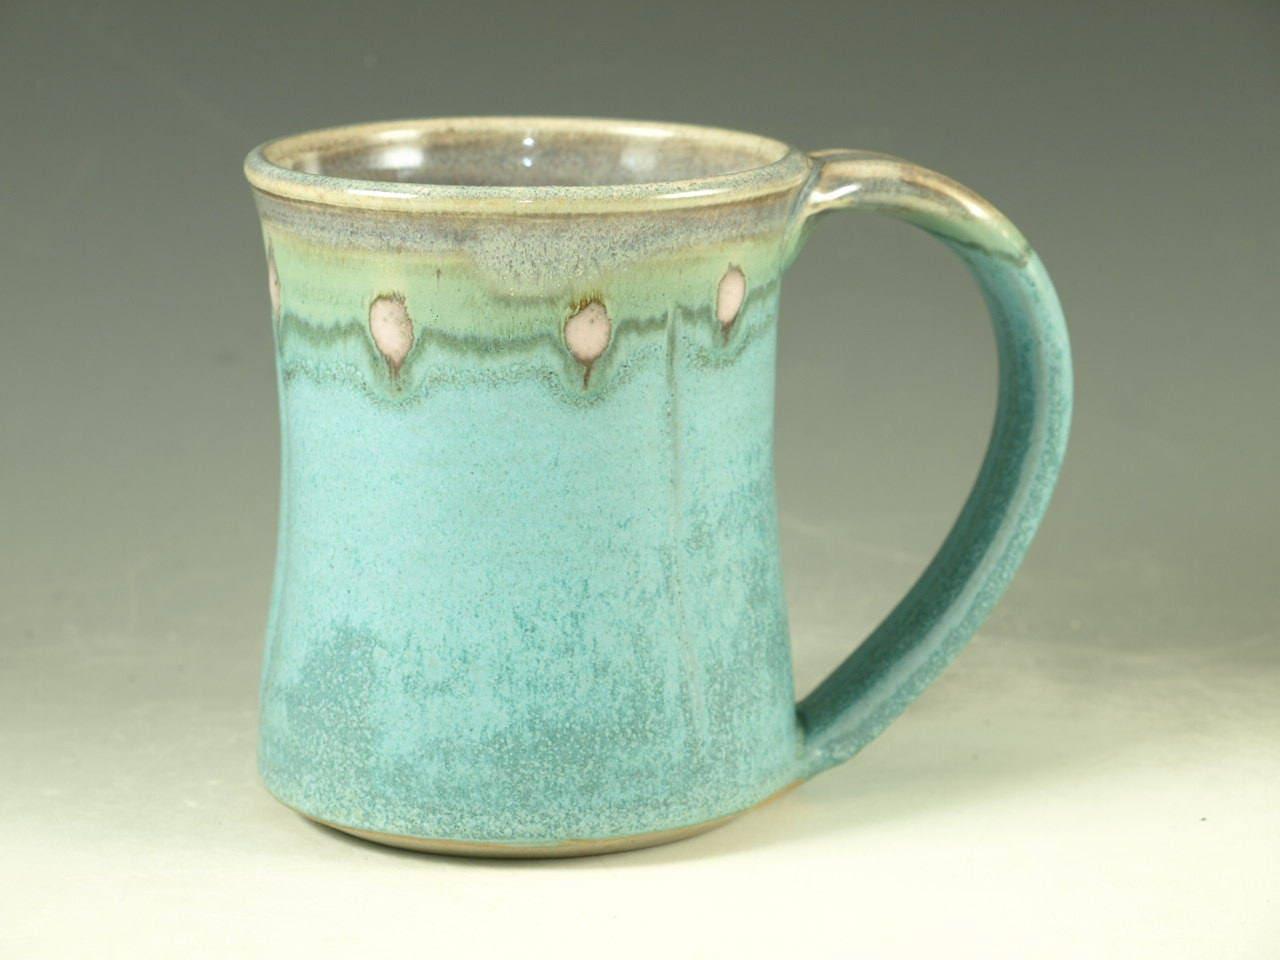 Coffee Mug Cup Large Ceramic Handmade Mugs With Large Handle